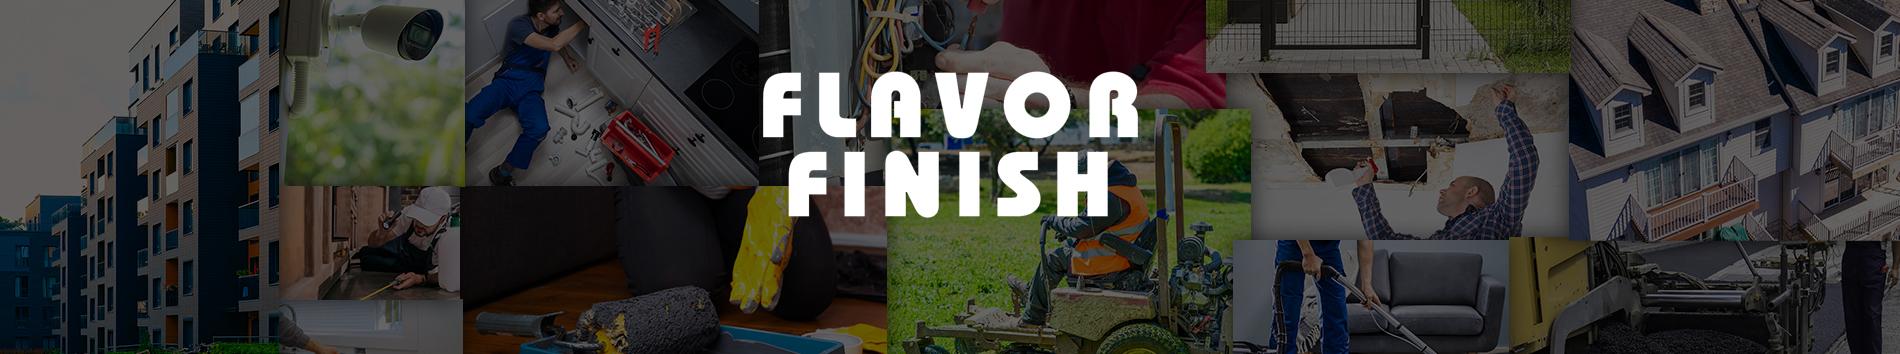 Flavor Finish